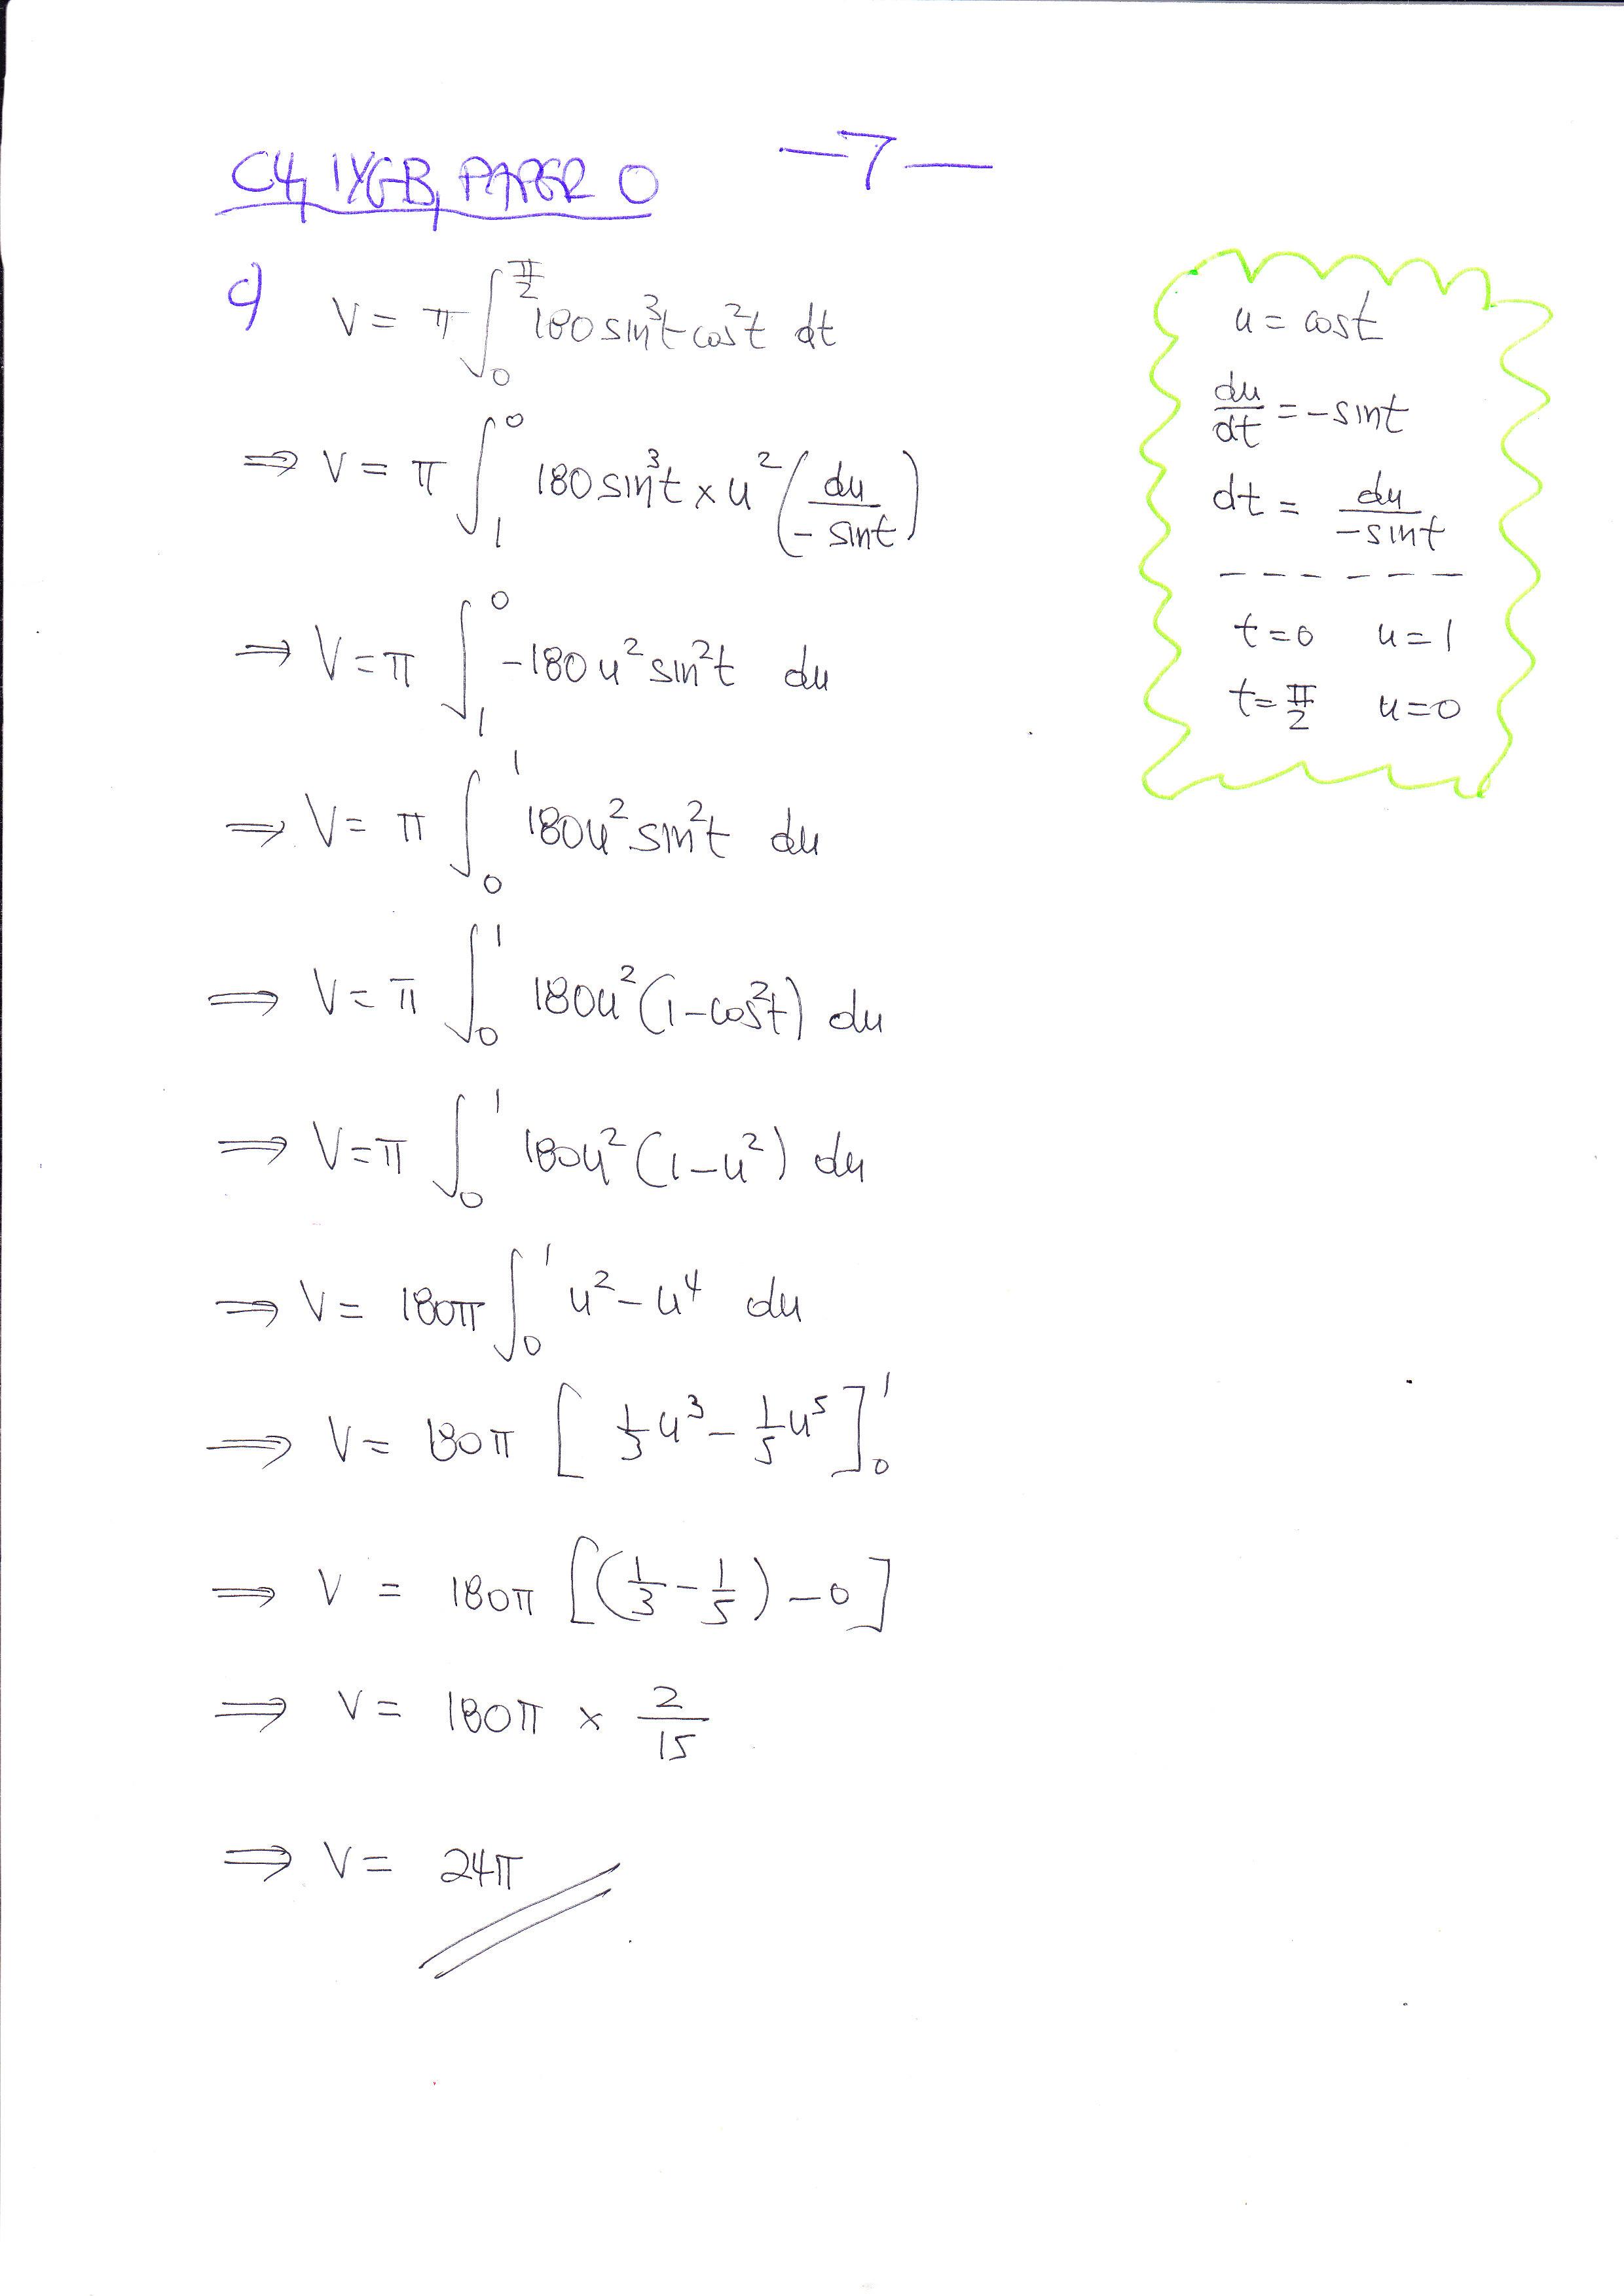 Name:  C4, IYGB, Paper O, page 7.jpg Views: 76 Size:  485.6 KB